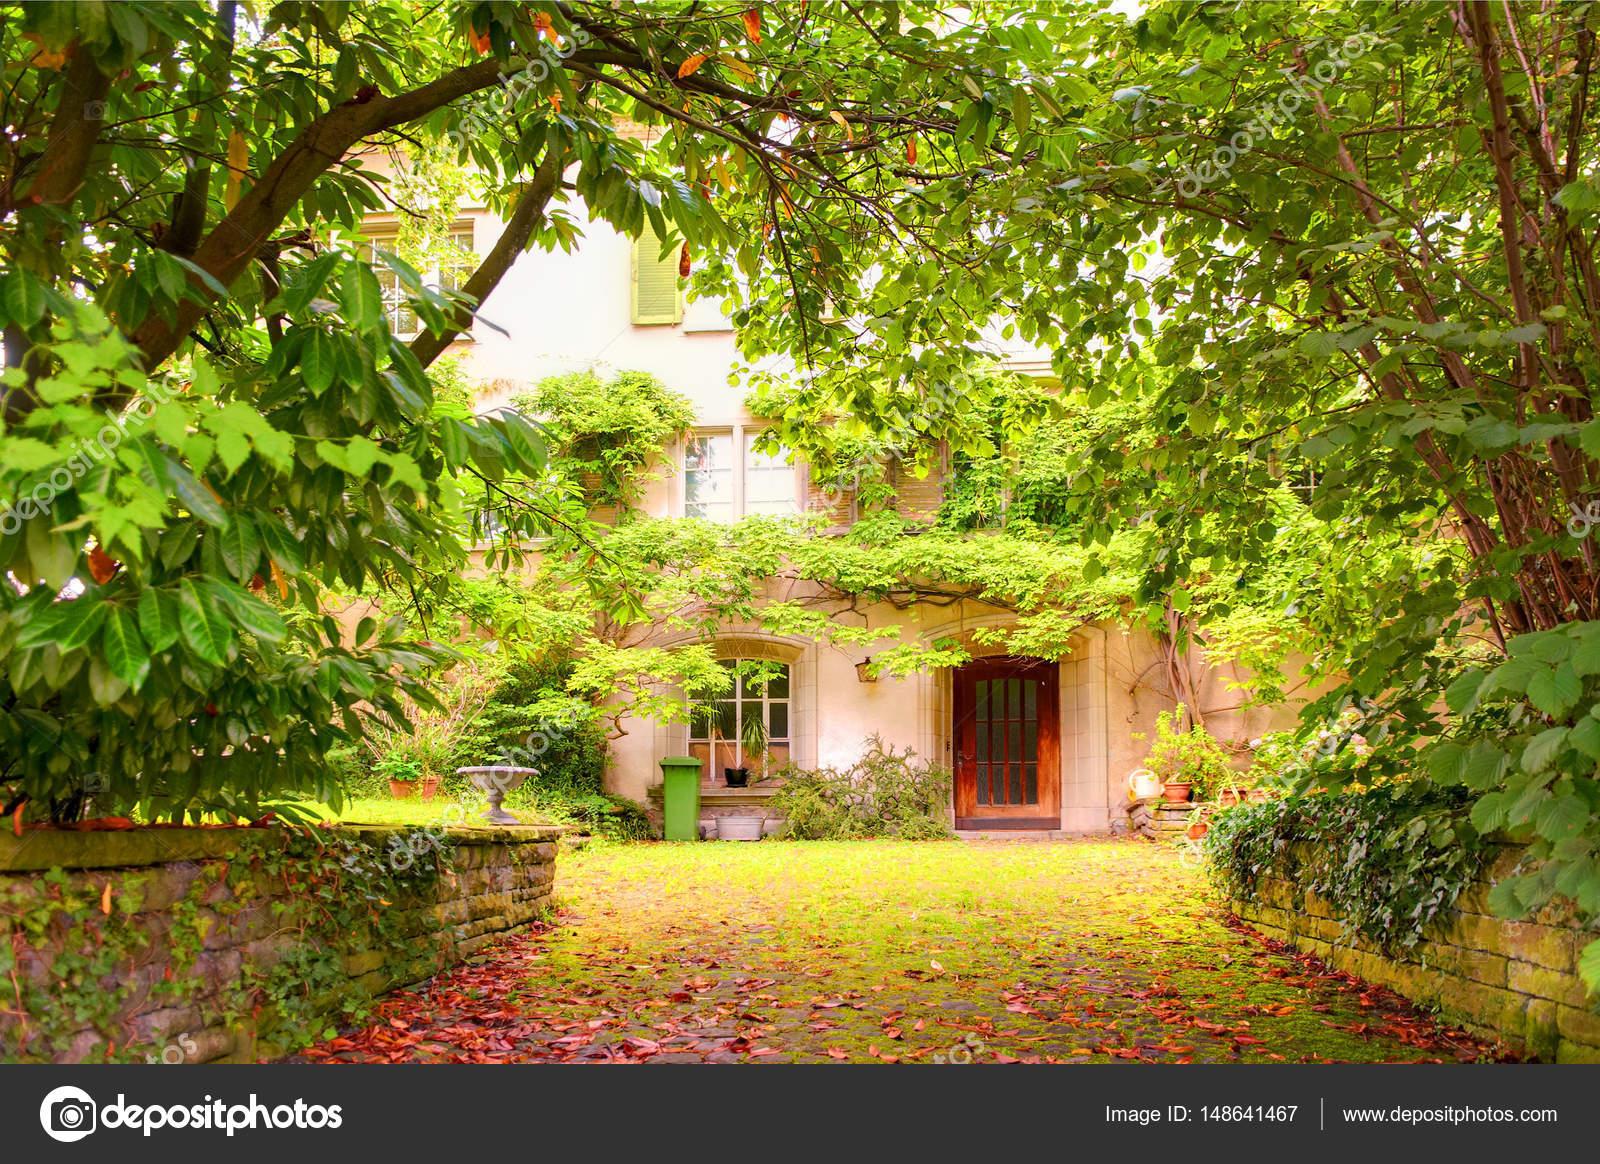 Garten Im September im herbst september blick auf haus garten innenhof in meilen stadt